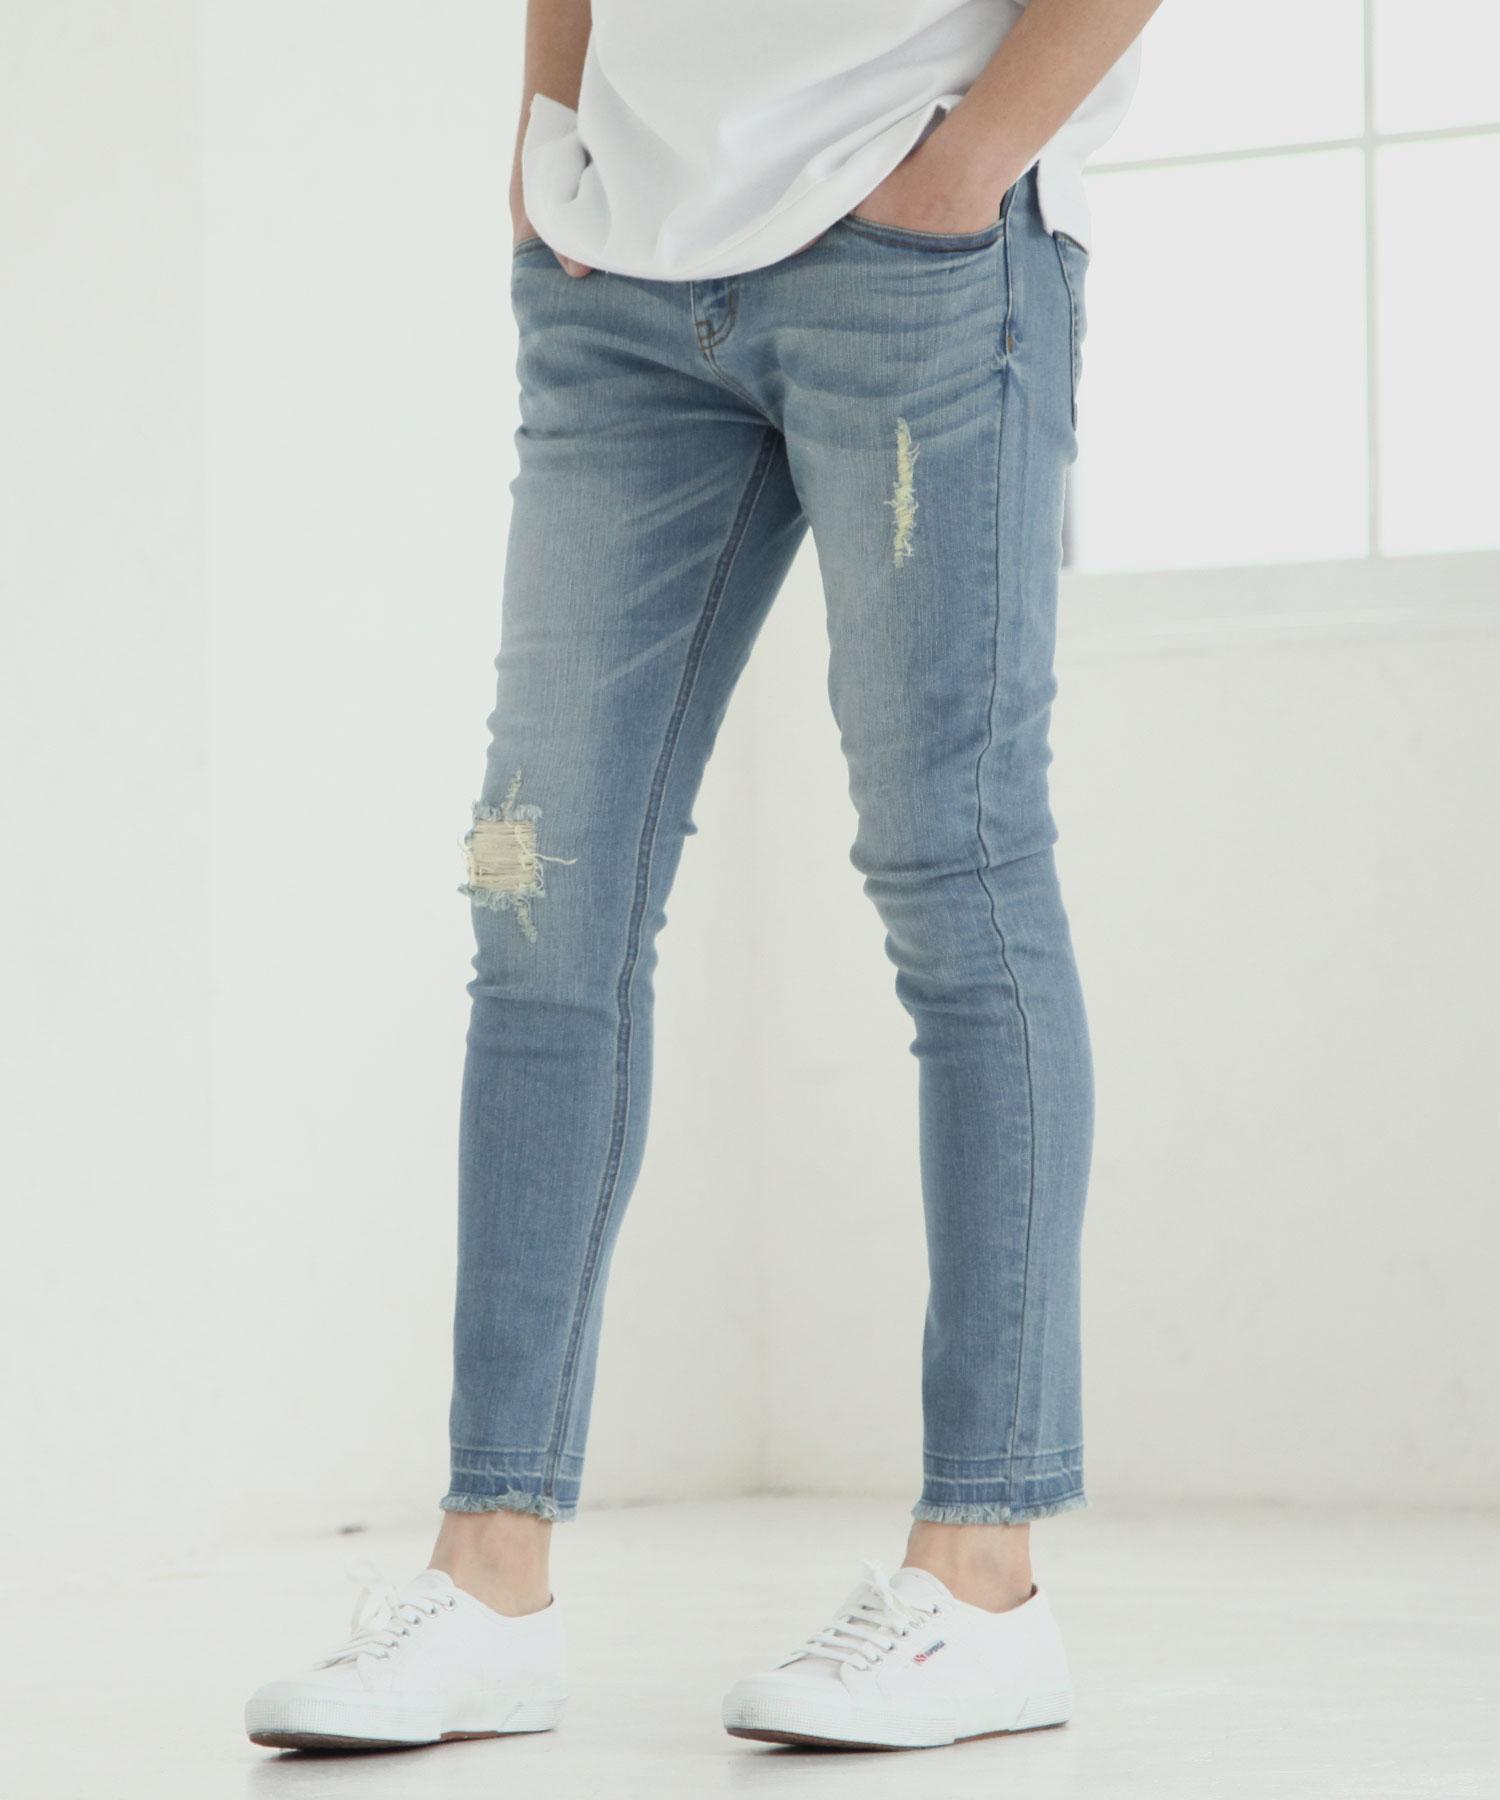 【Nilway】彈力窄管牛仔褲 破壞加工 1